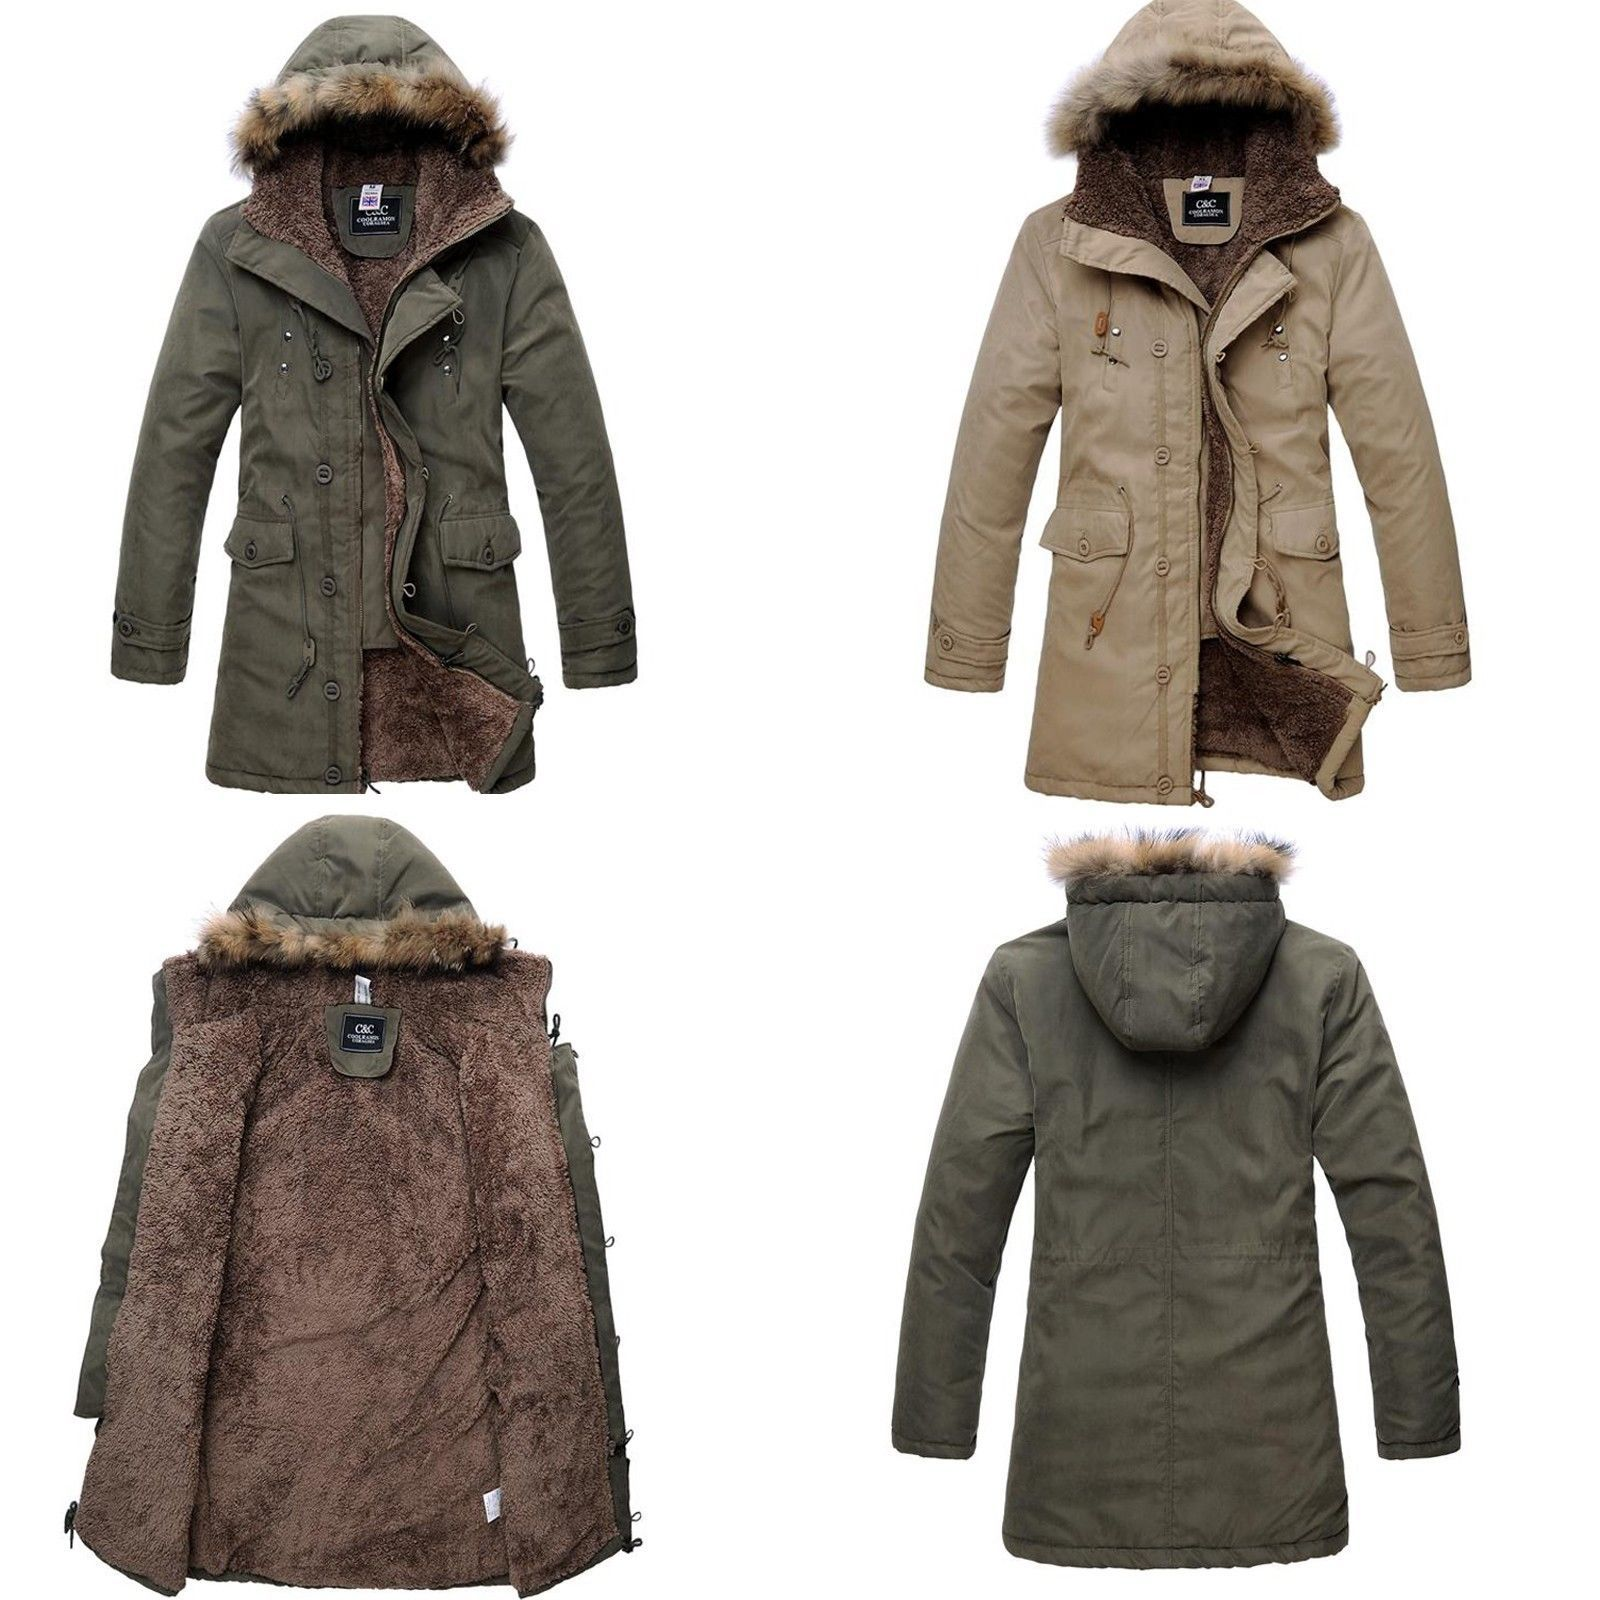 53ba907513be MEN S Military Hooded FUR Collar Winter Warm Long Coat Jackets Parka  Outerwear